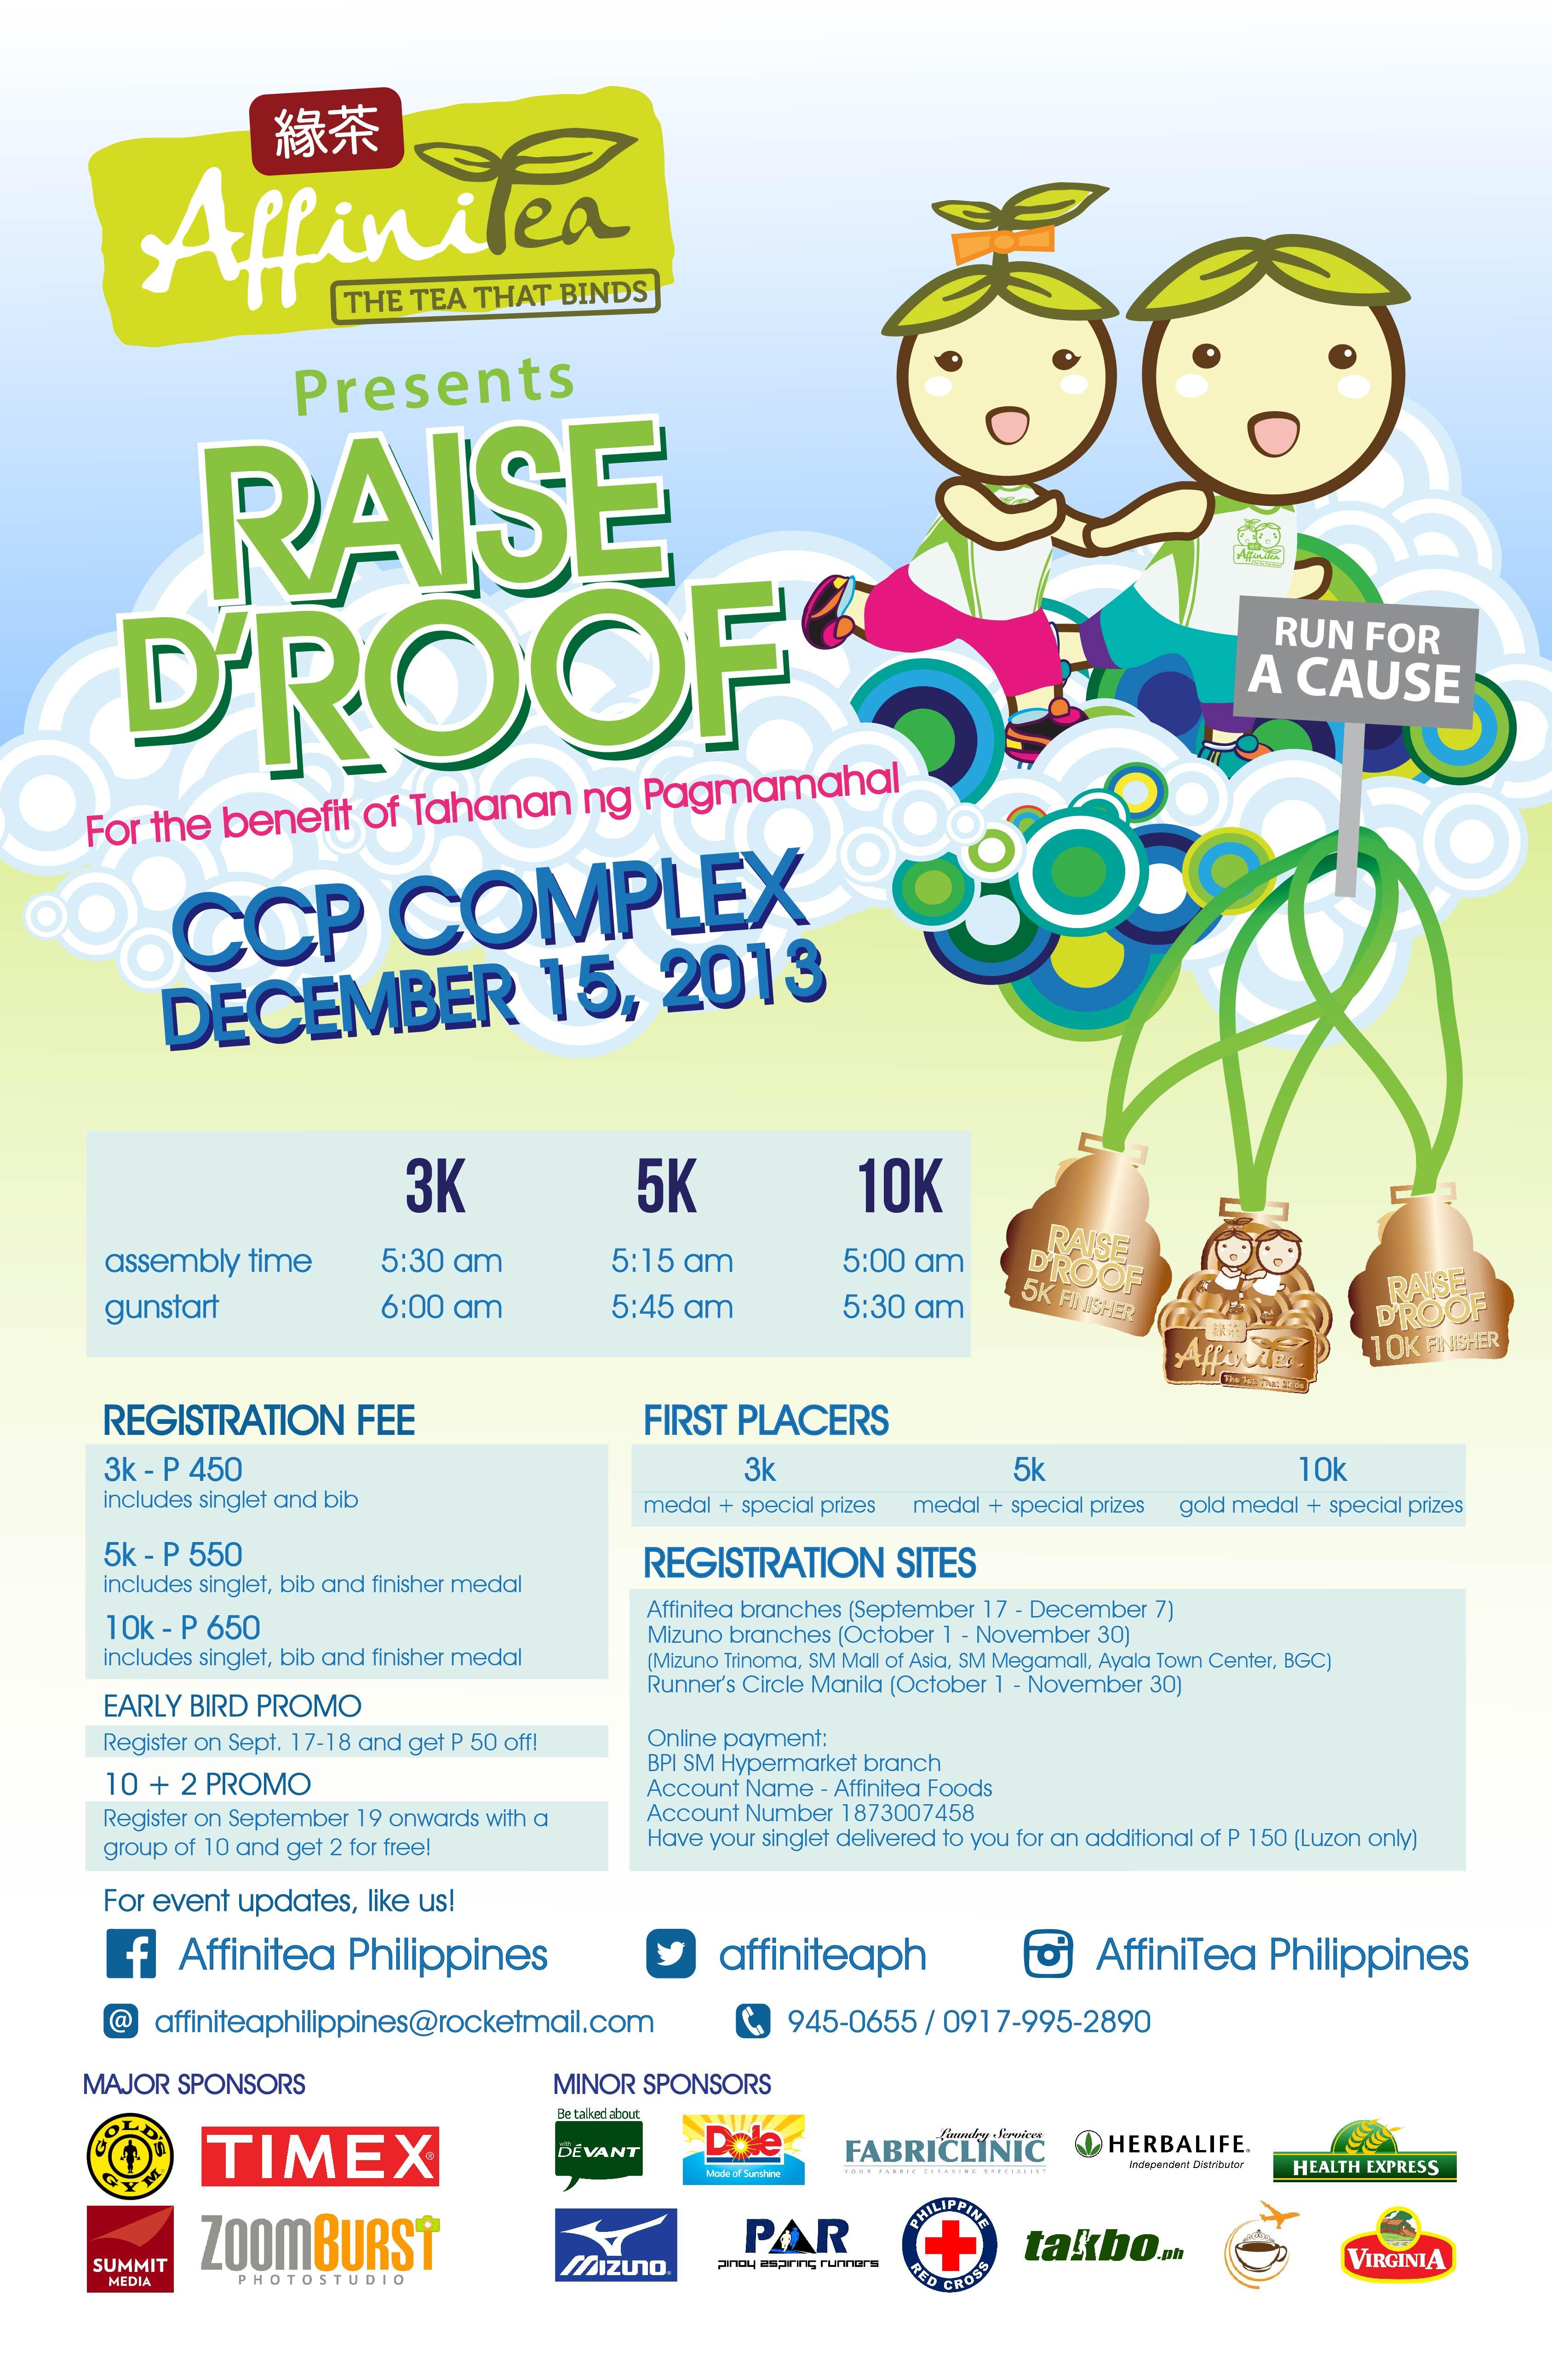 affinitea-raise-d-roof-2013-poster